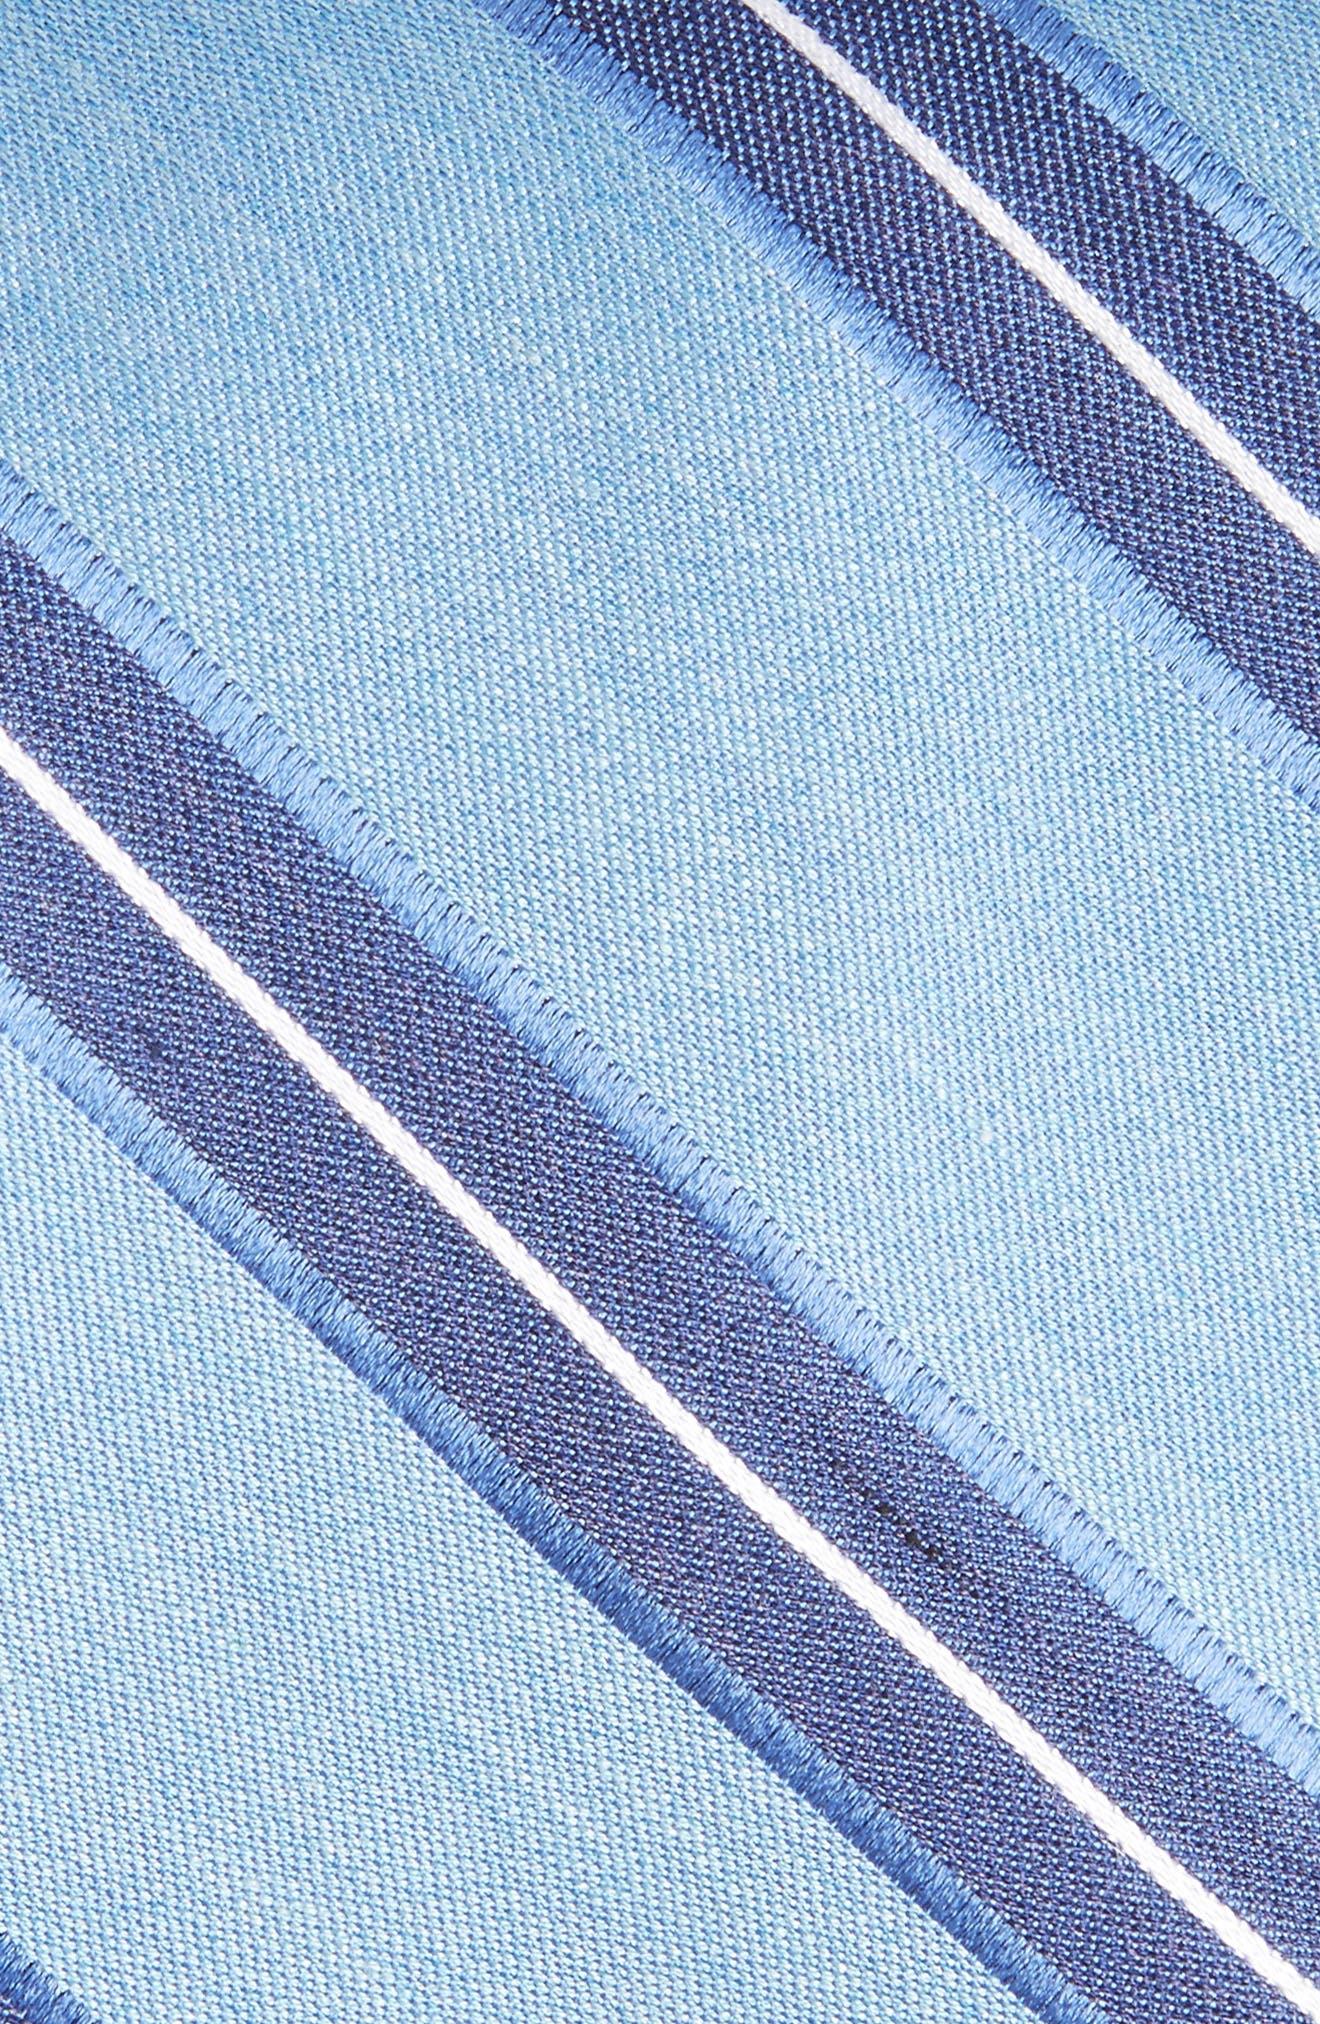 Peralba Stripe Silk Blend Tie,                             Alternate thumbnail 2, color,                             Light Blue